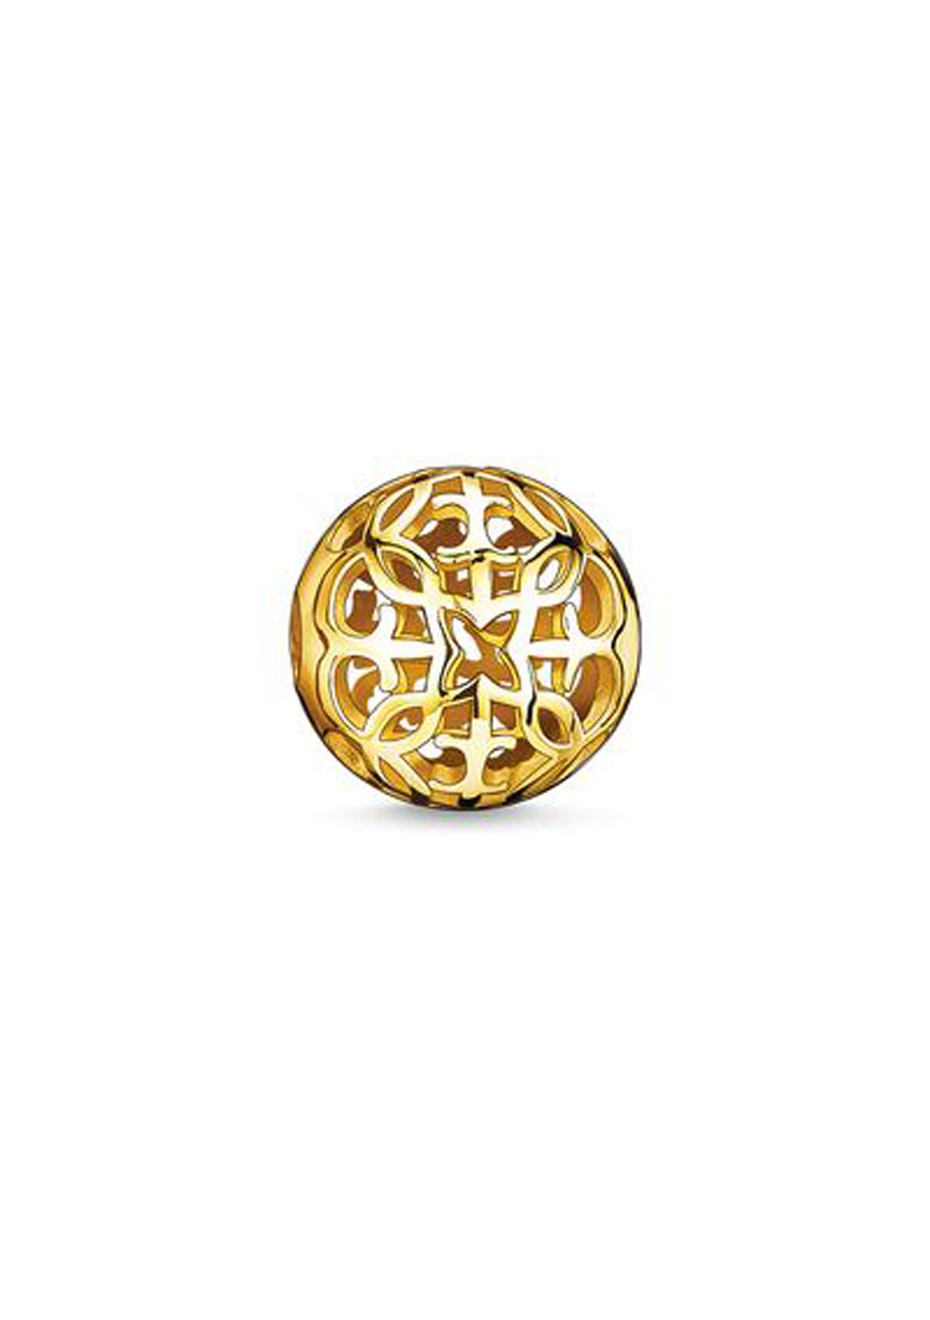 Thomas Sabo  - Karma Bead - Yellow Gold Plated Arabesque